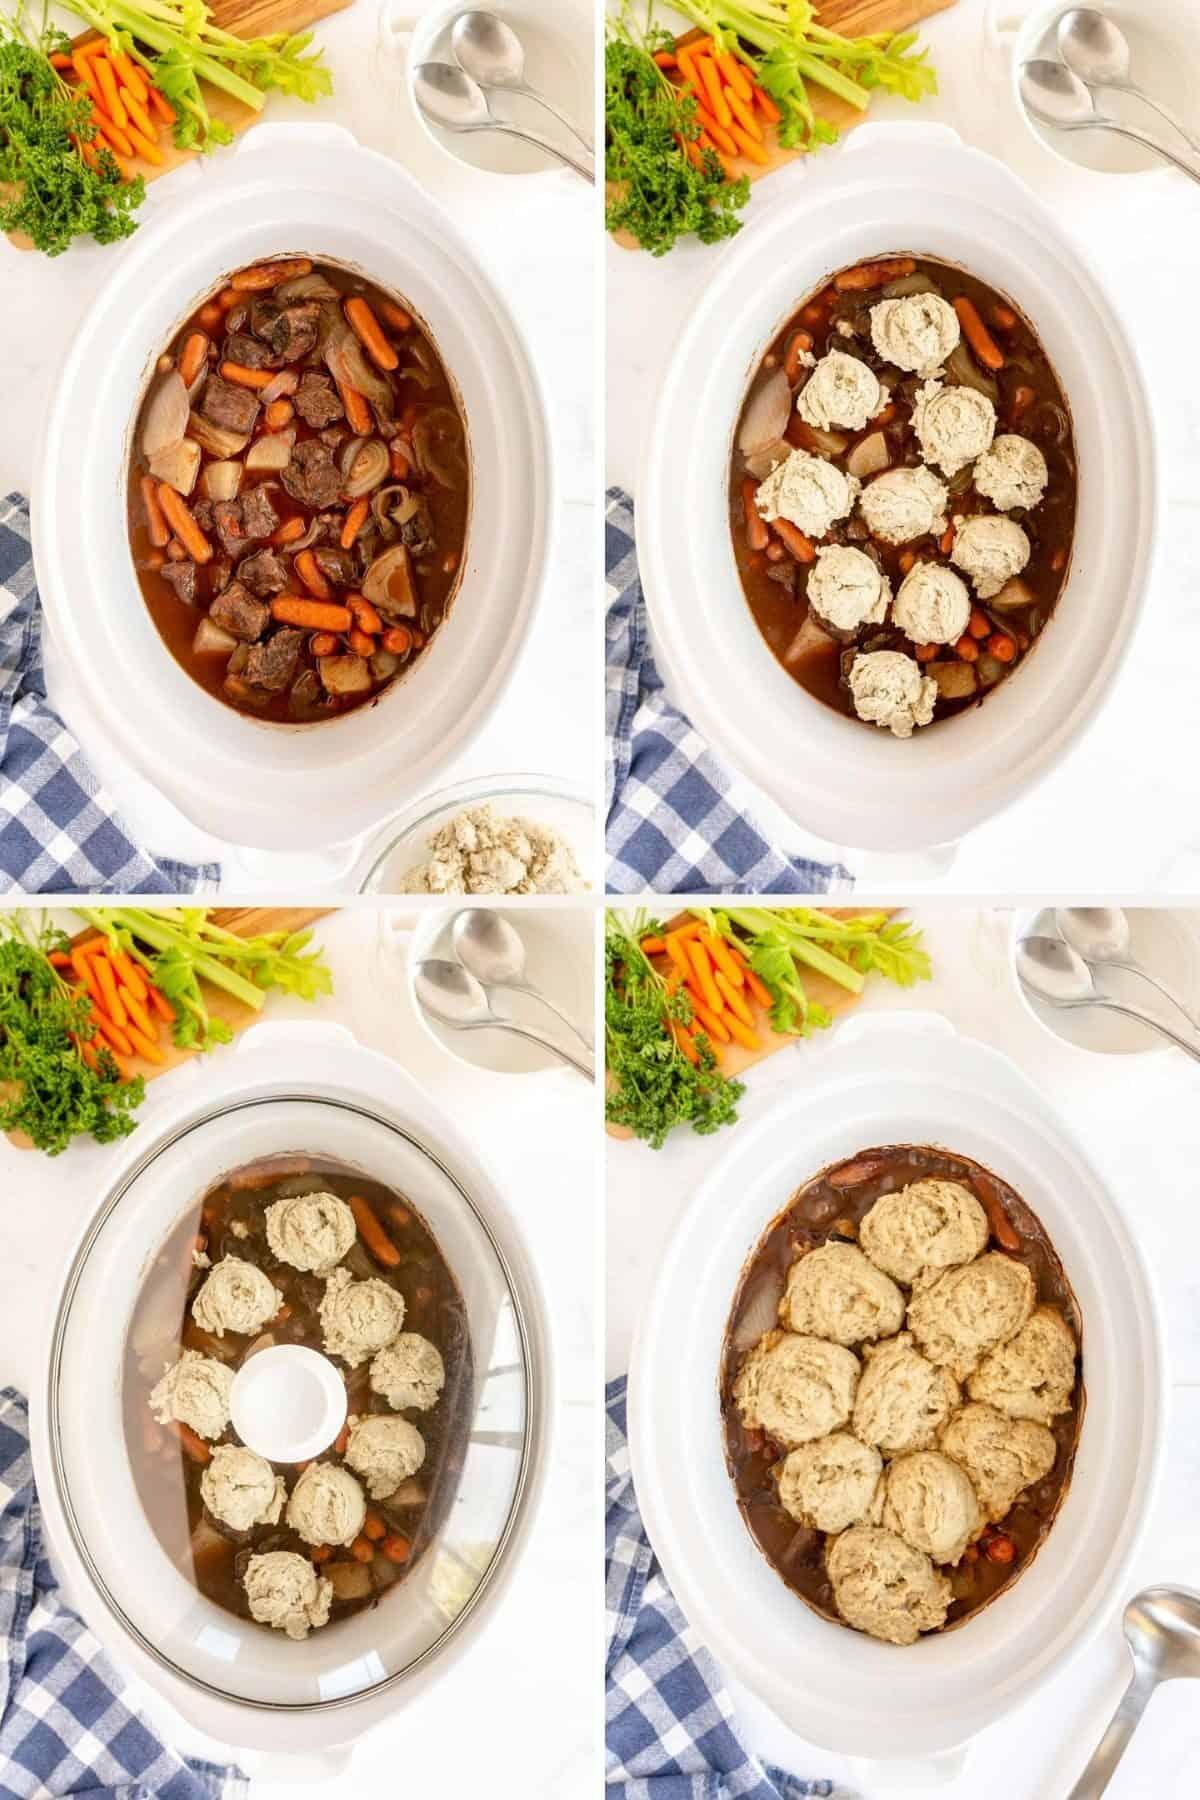 cooking dumplings in a crockpot beef stew